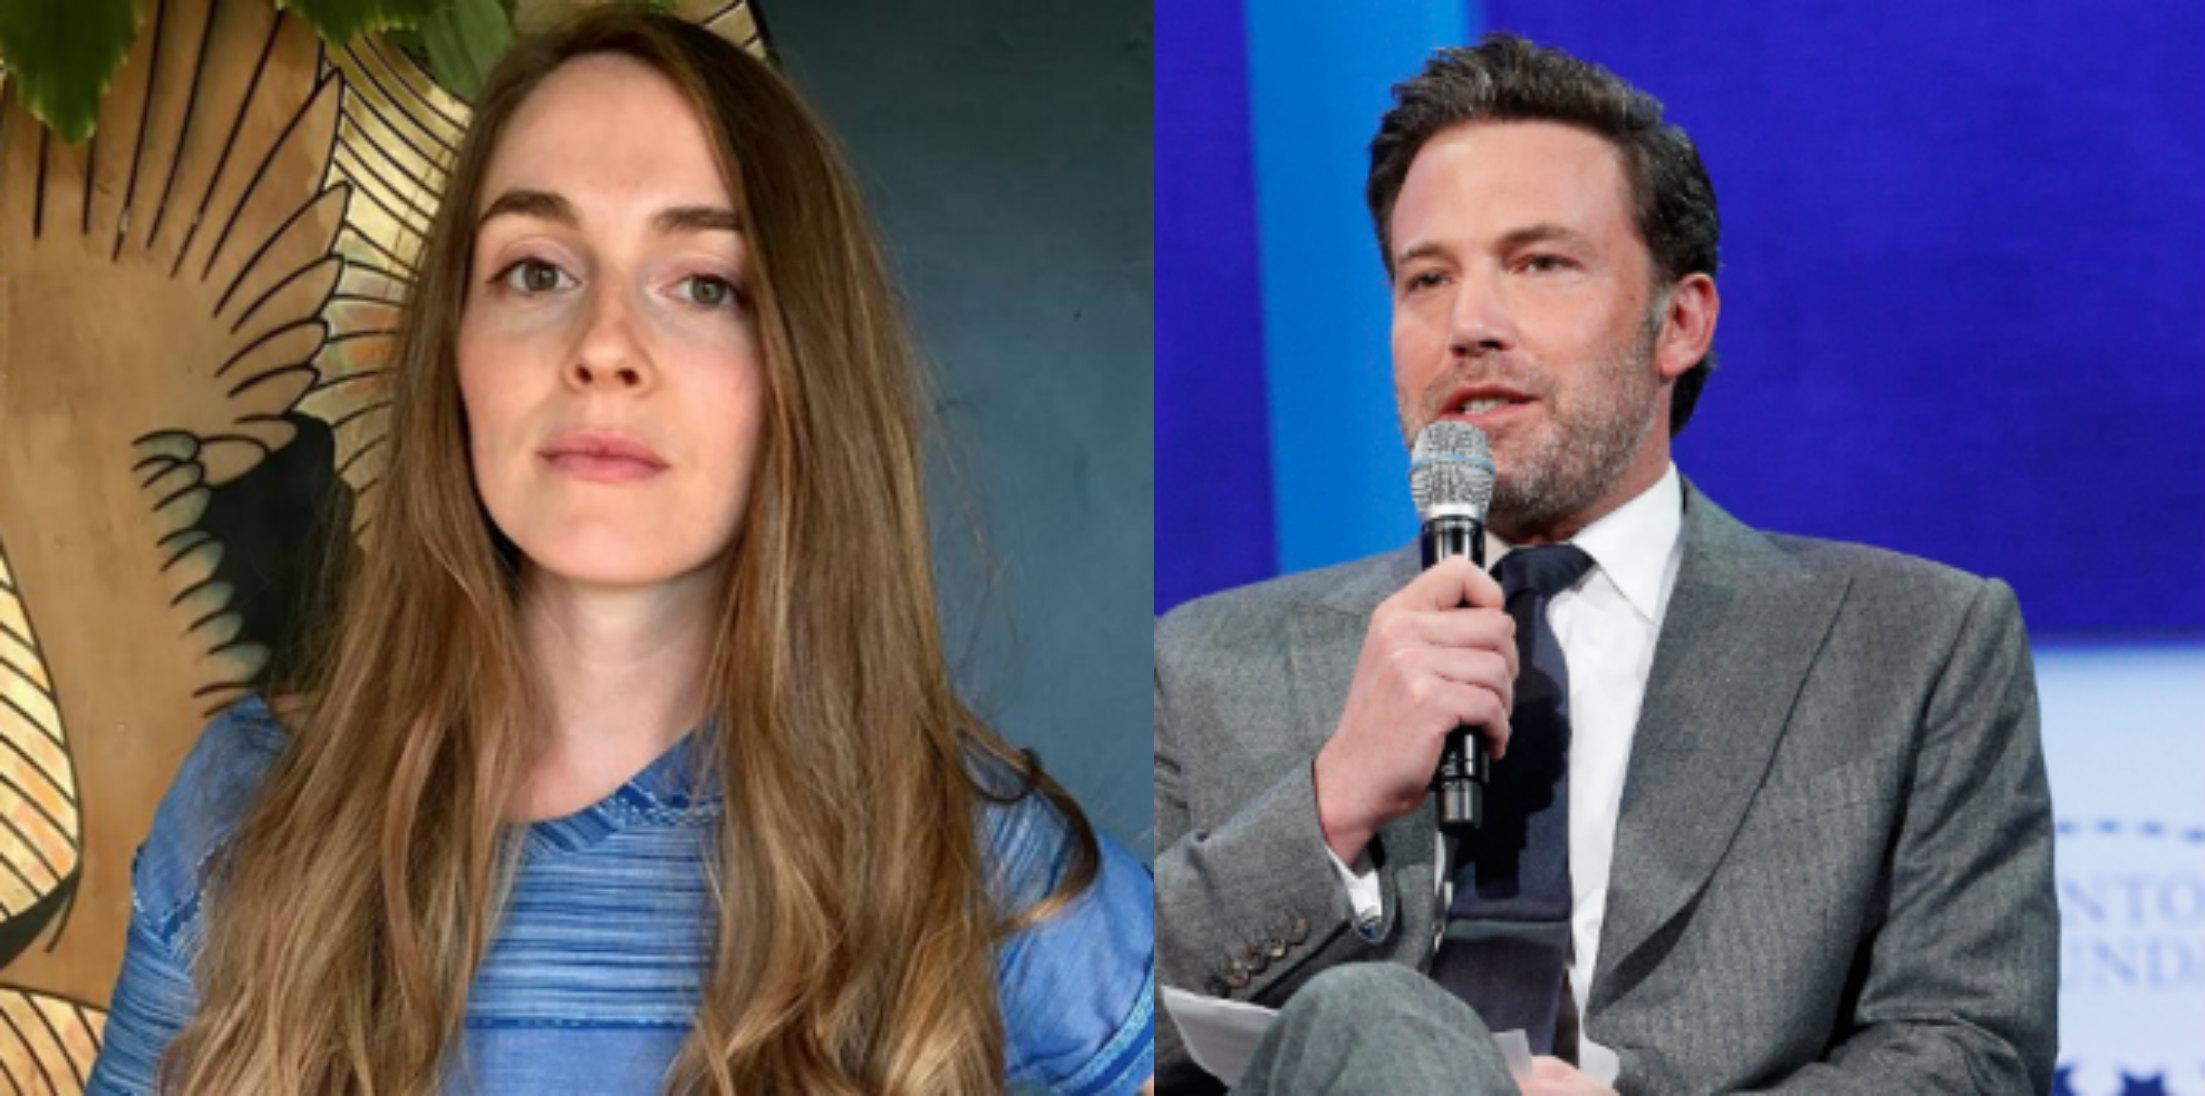 Ben Affleck Accused Groping Another Woman Weinstein Scandal hero